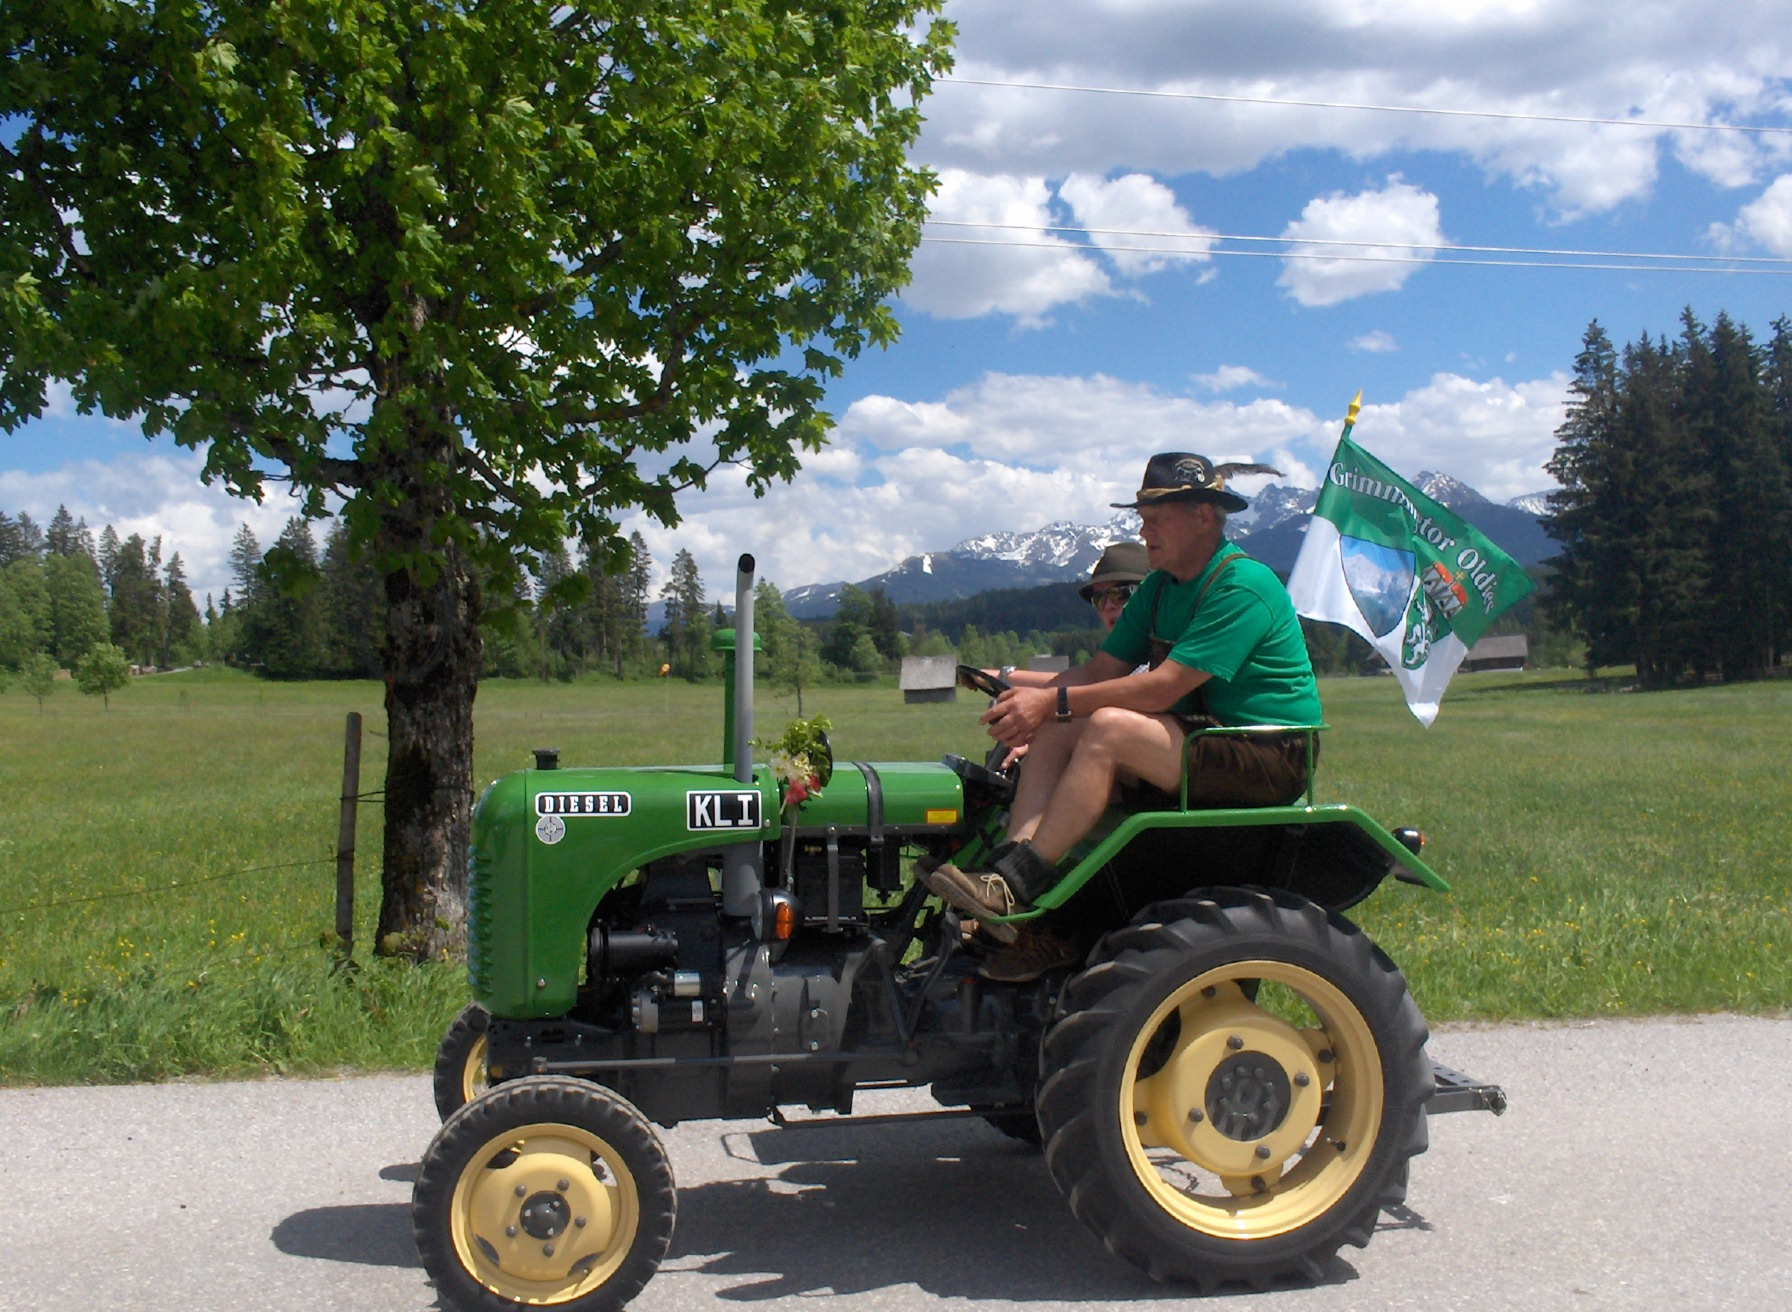 Tractor festival